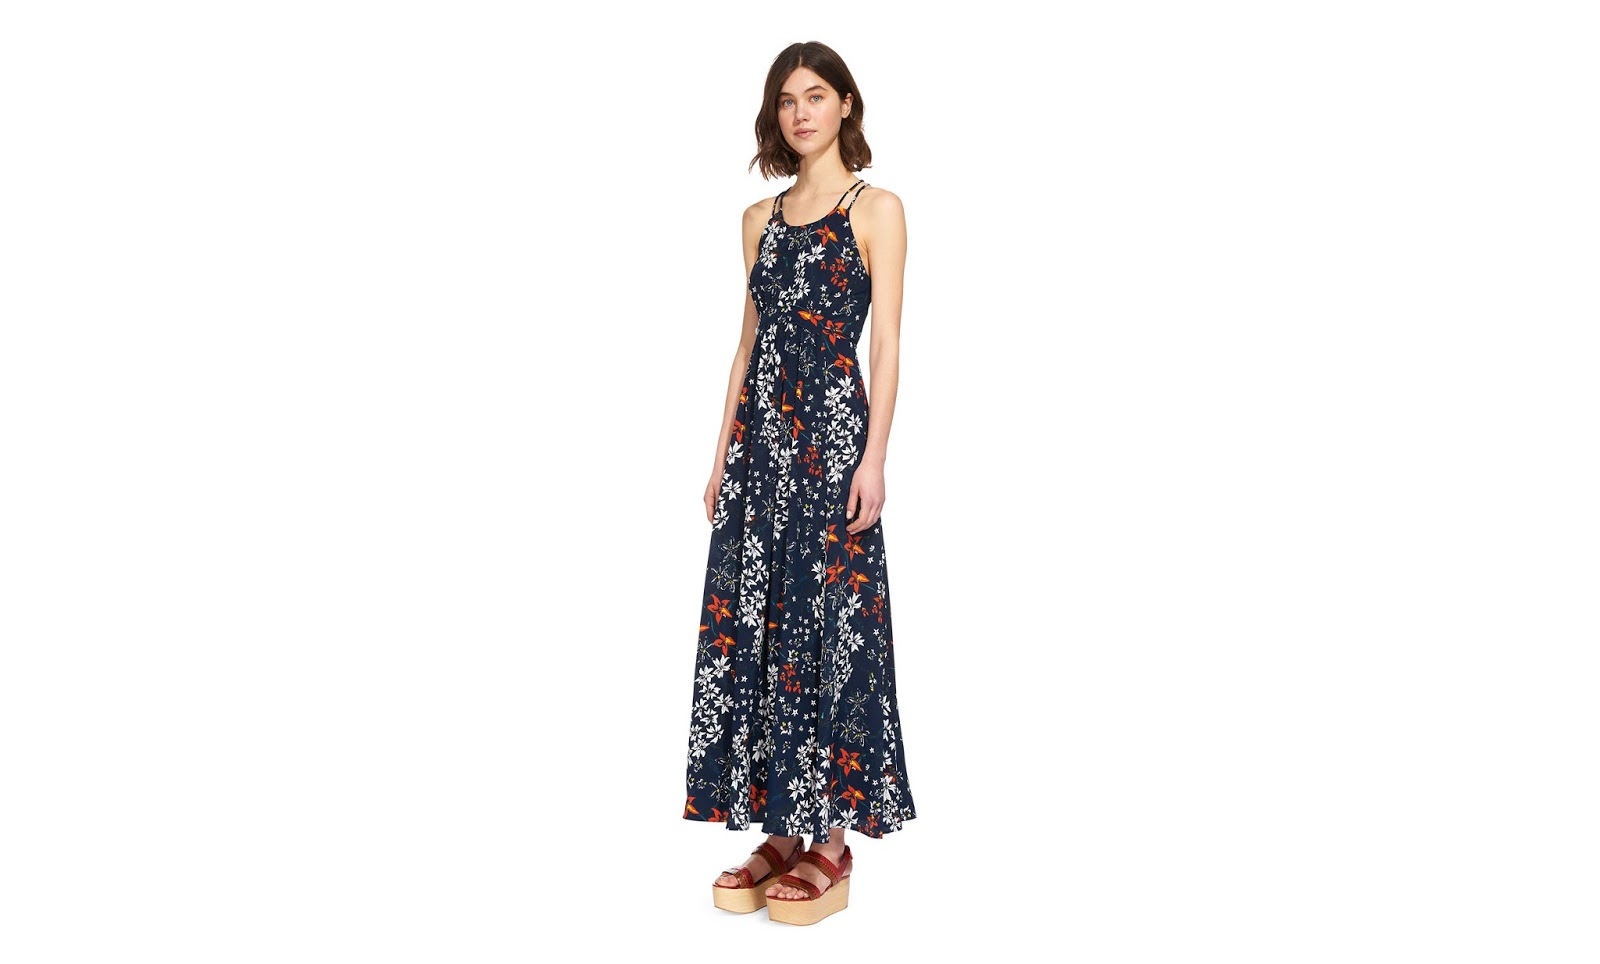 8347e502793b6 La Catarina! Seamwork dress | Sew Dixie Lou. | Bloglovin'